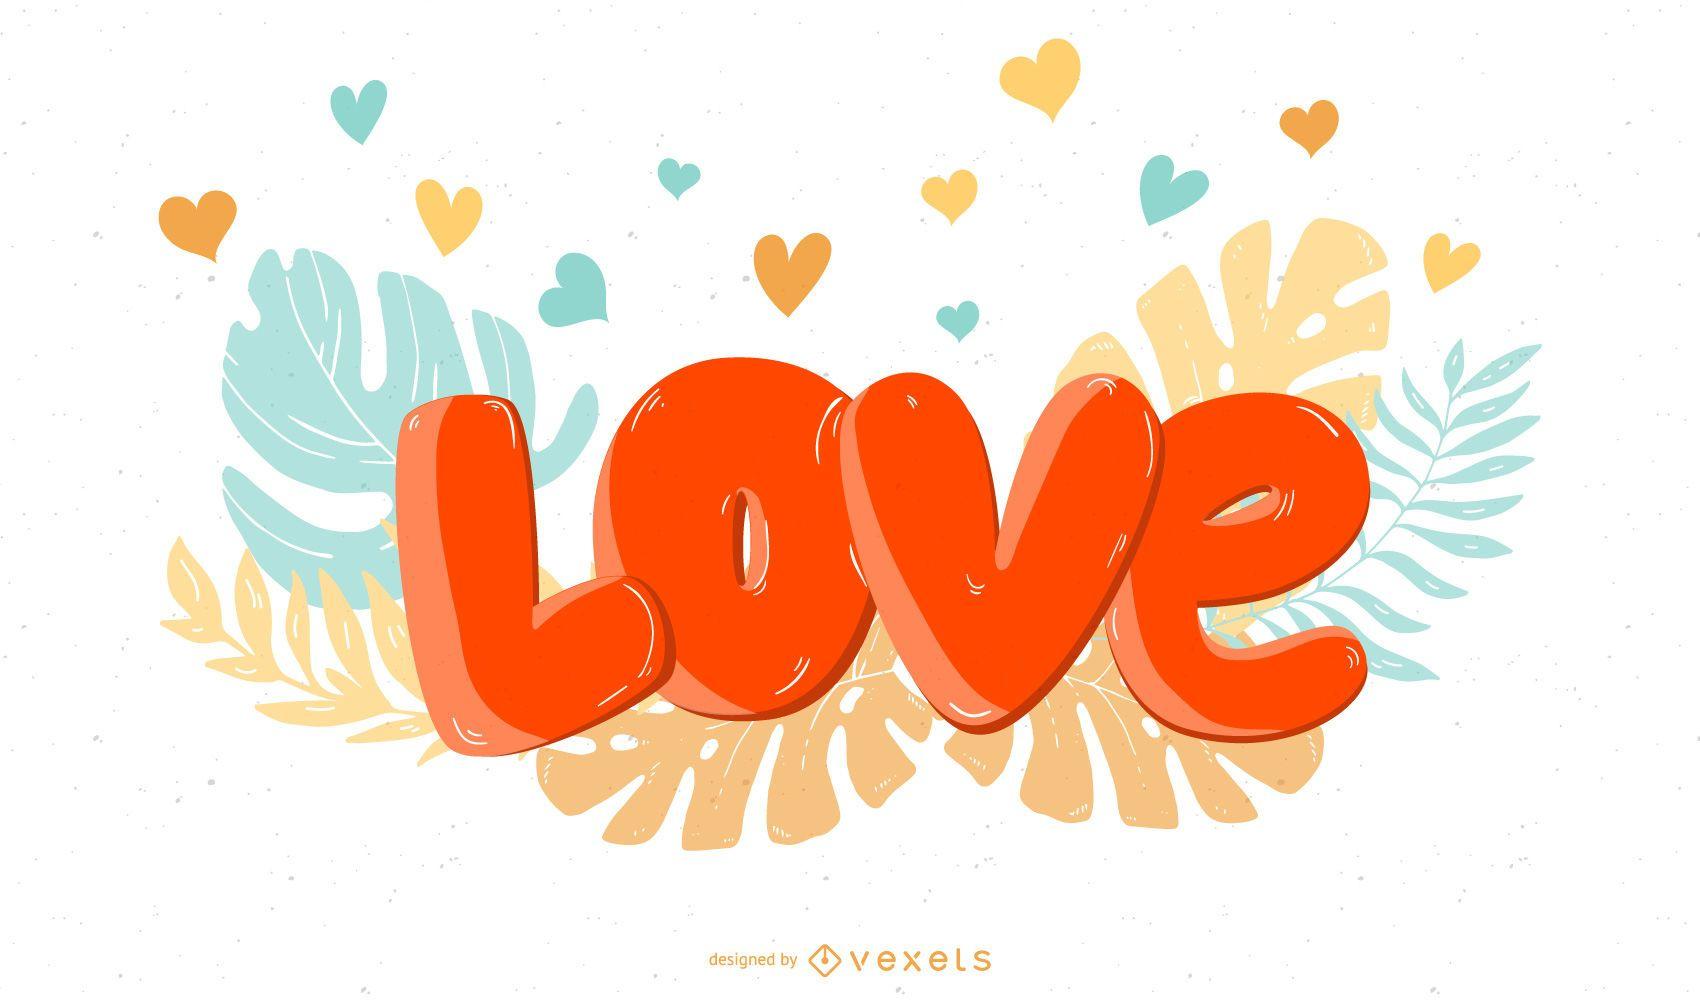 Arte vetorial colorida de fundo de amor